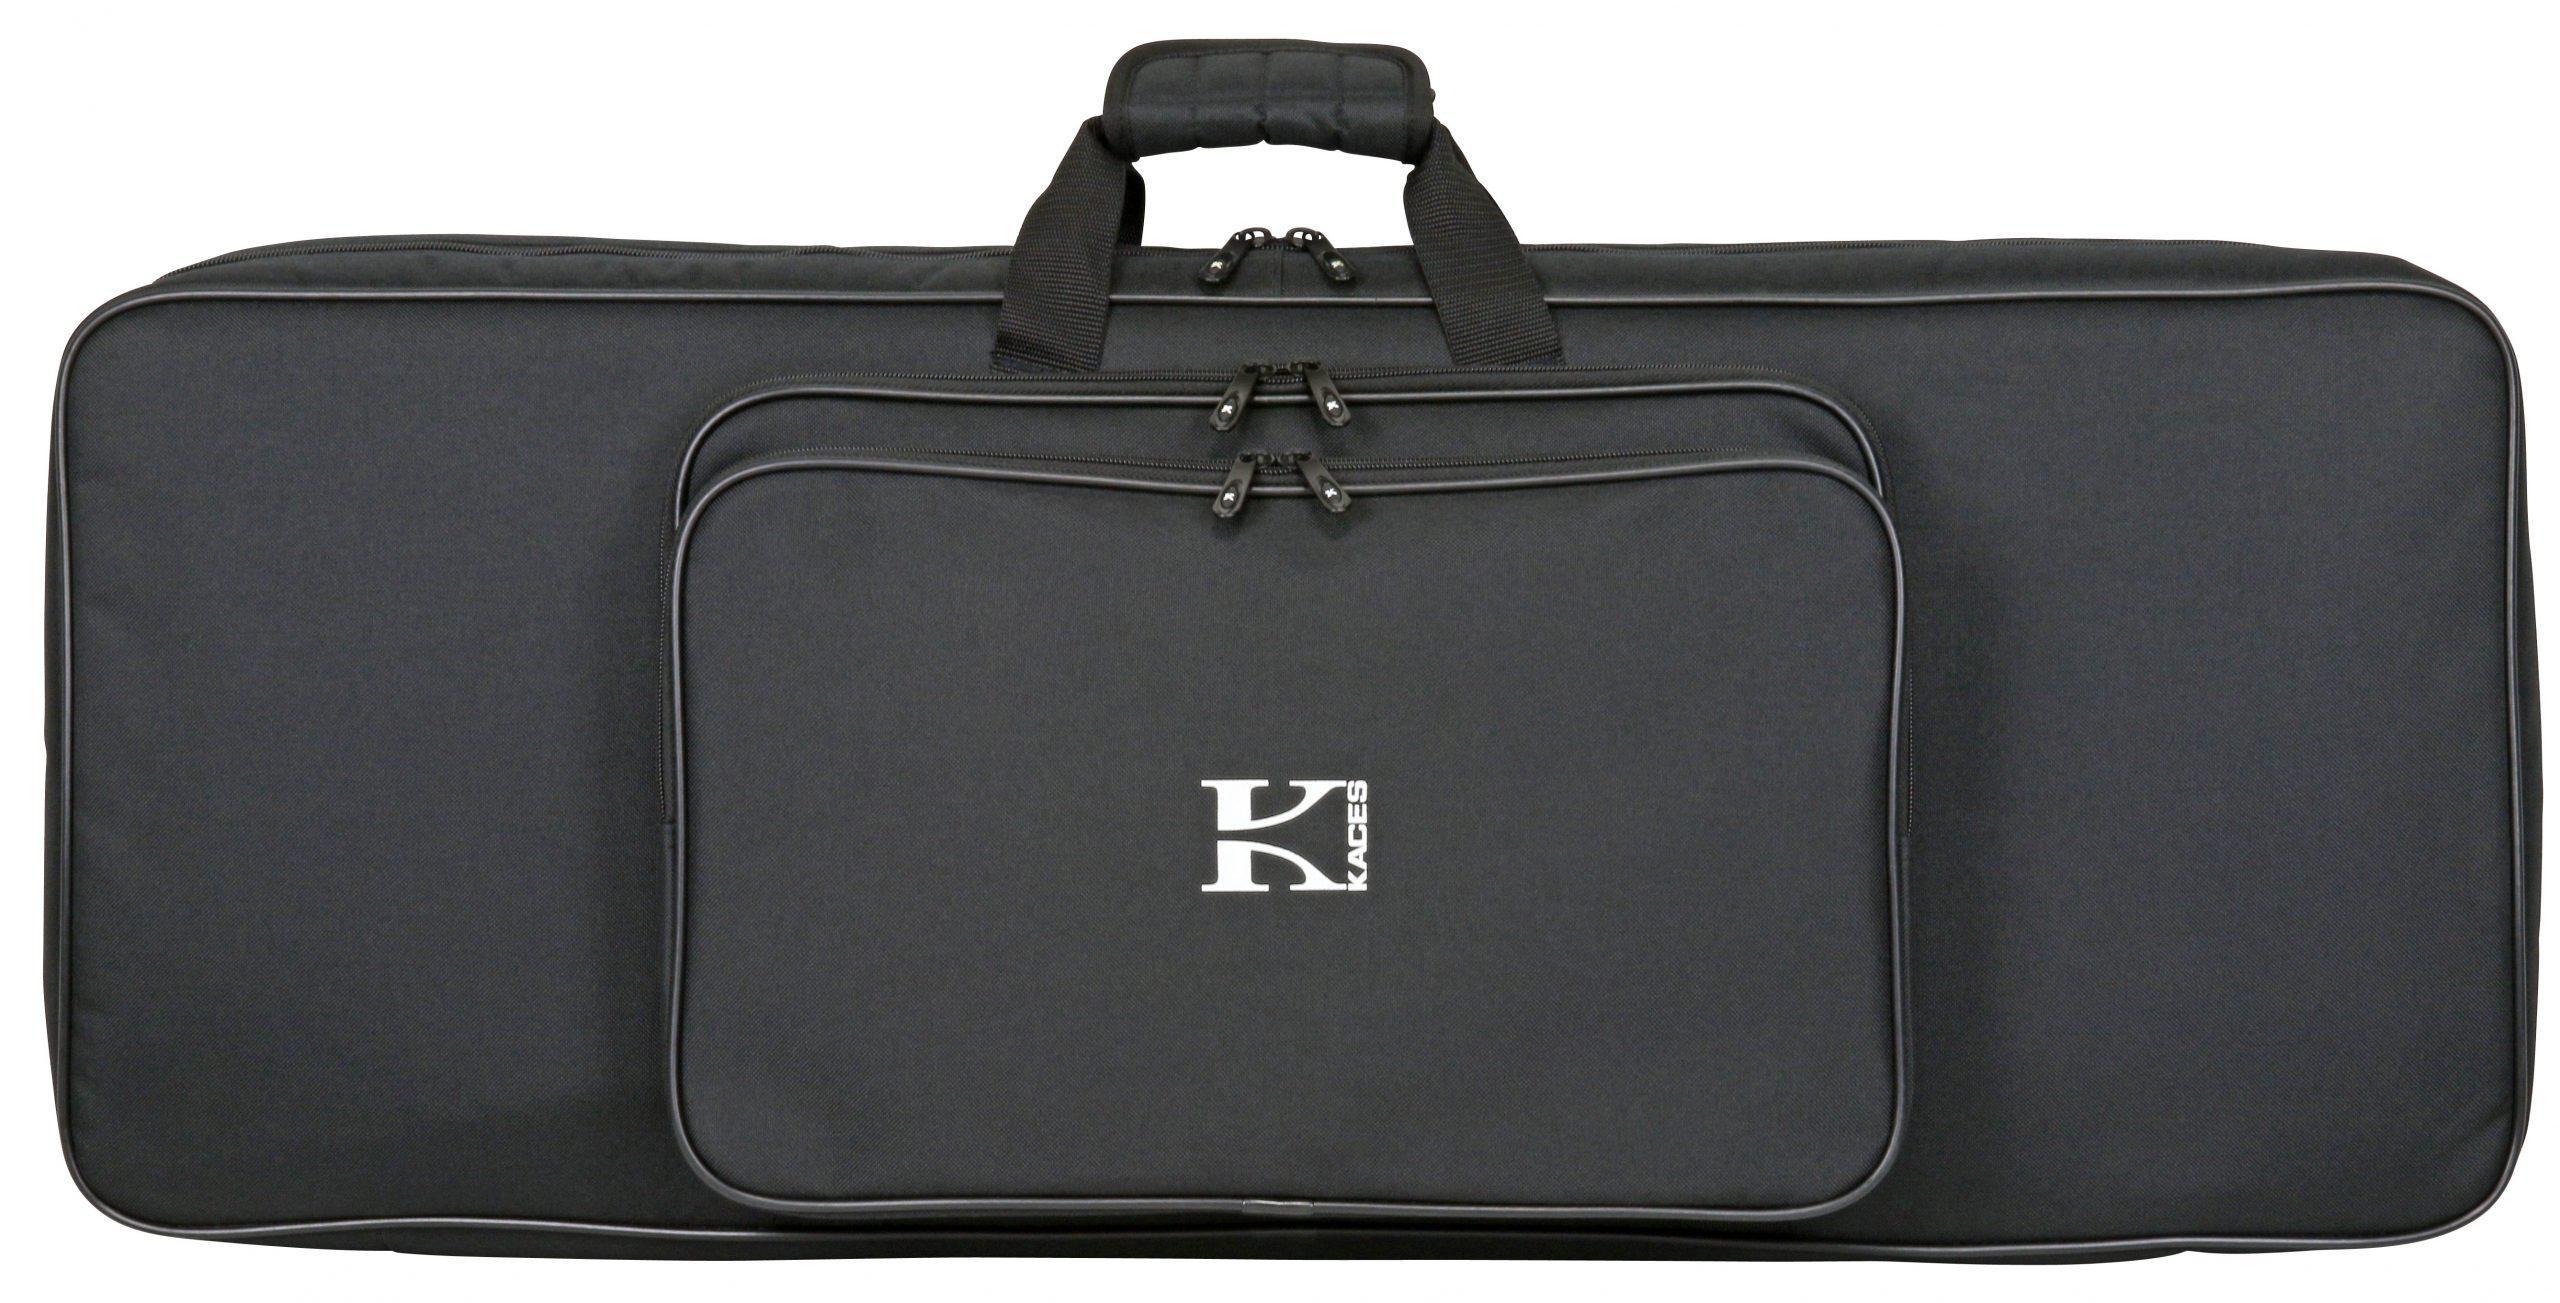 Xpress Keyboard Bag, 49 Note